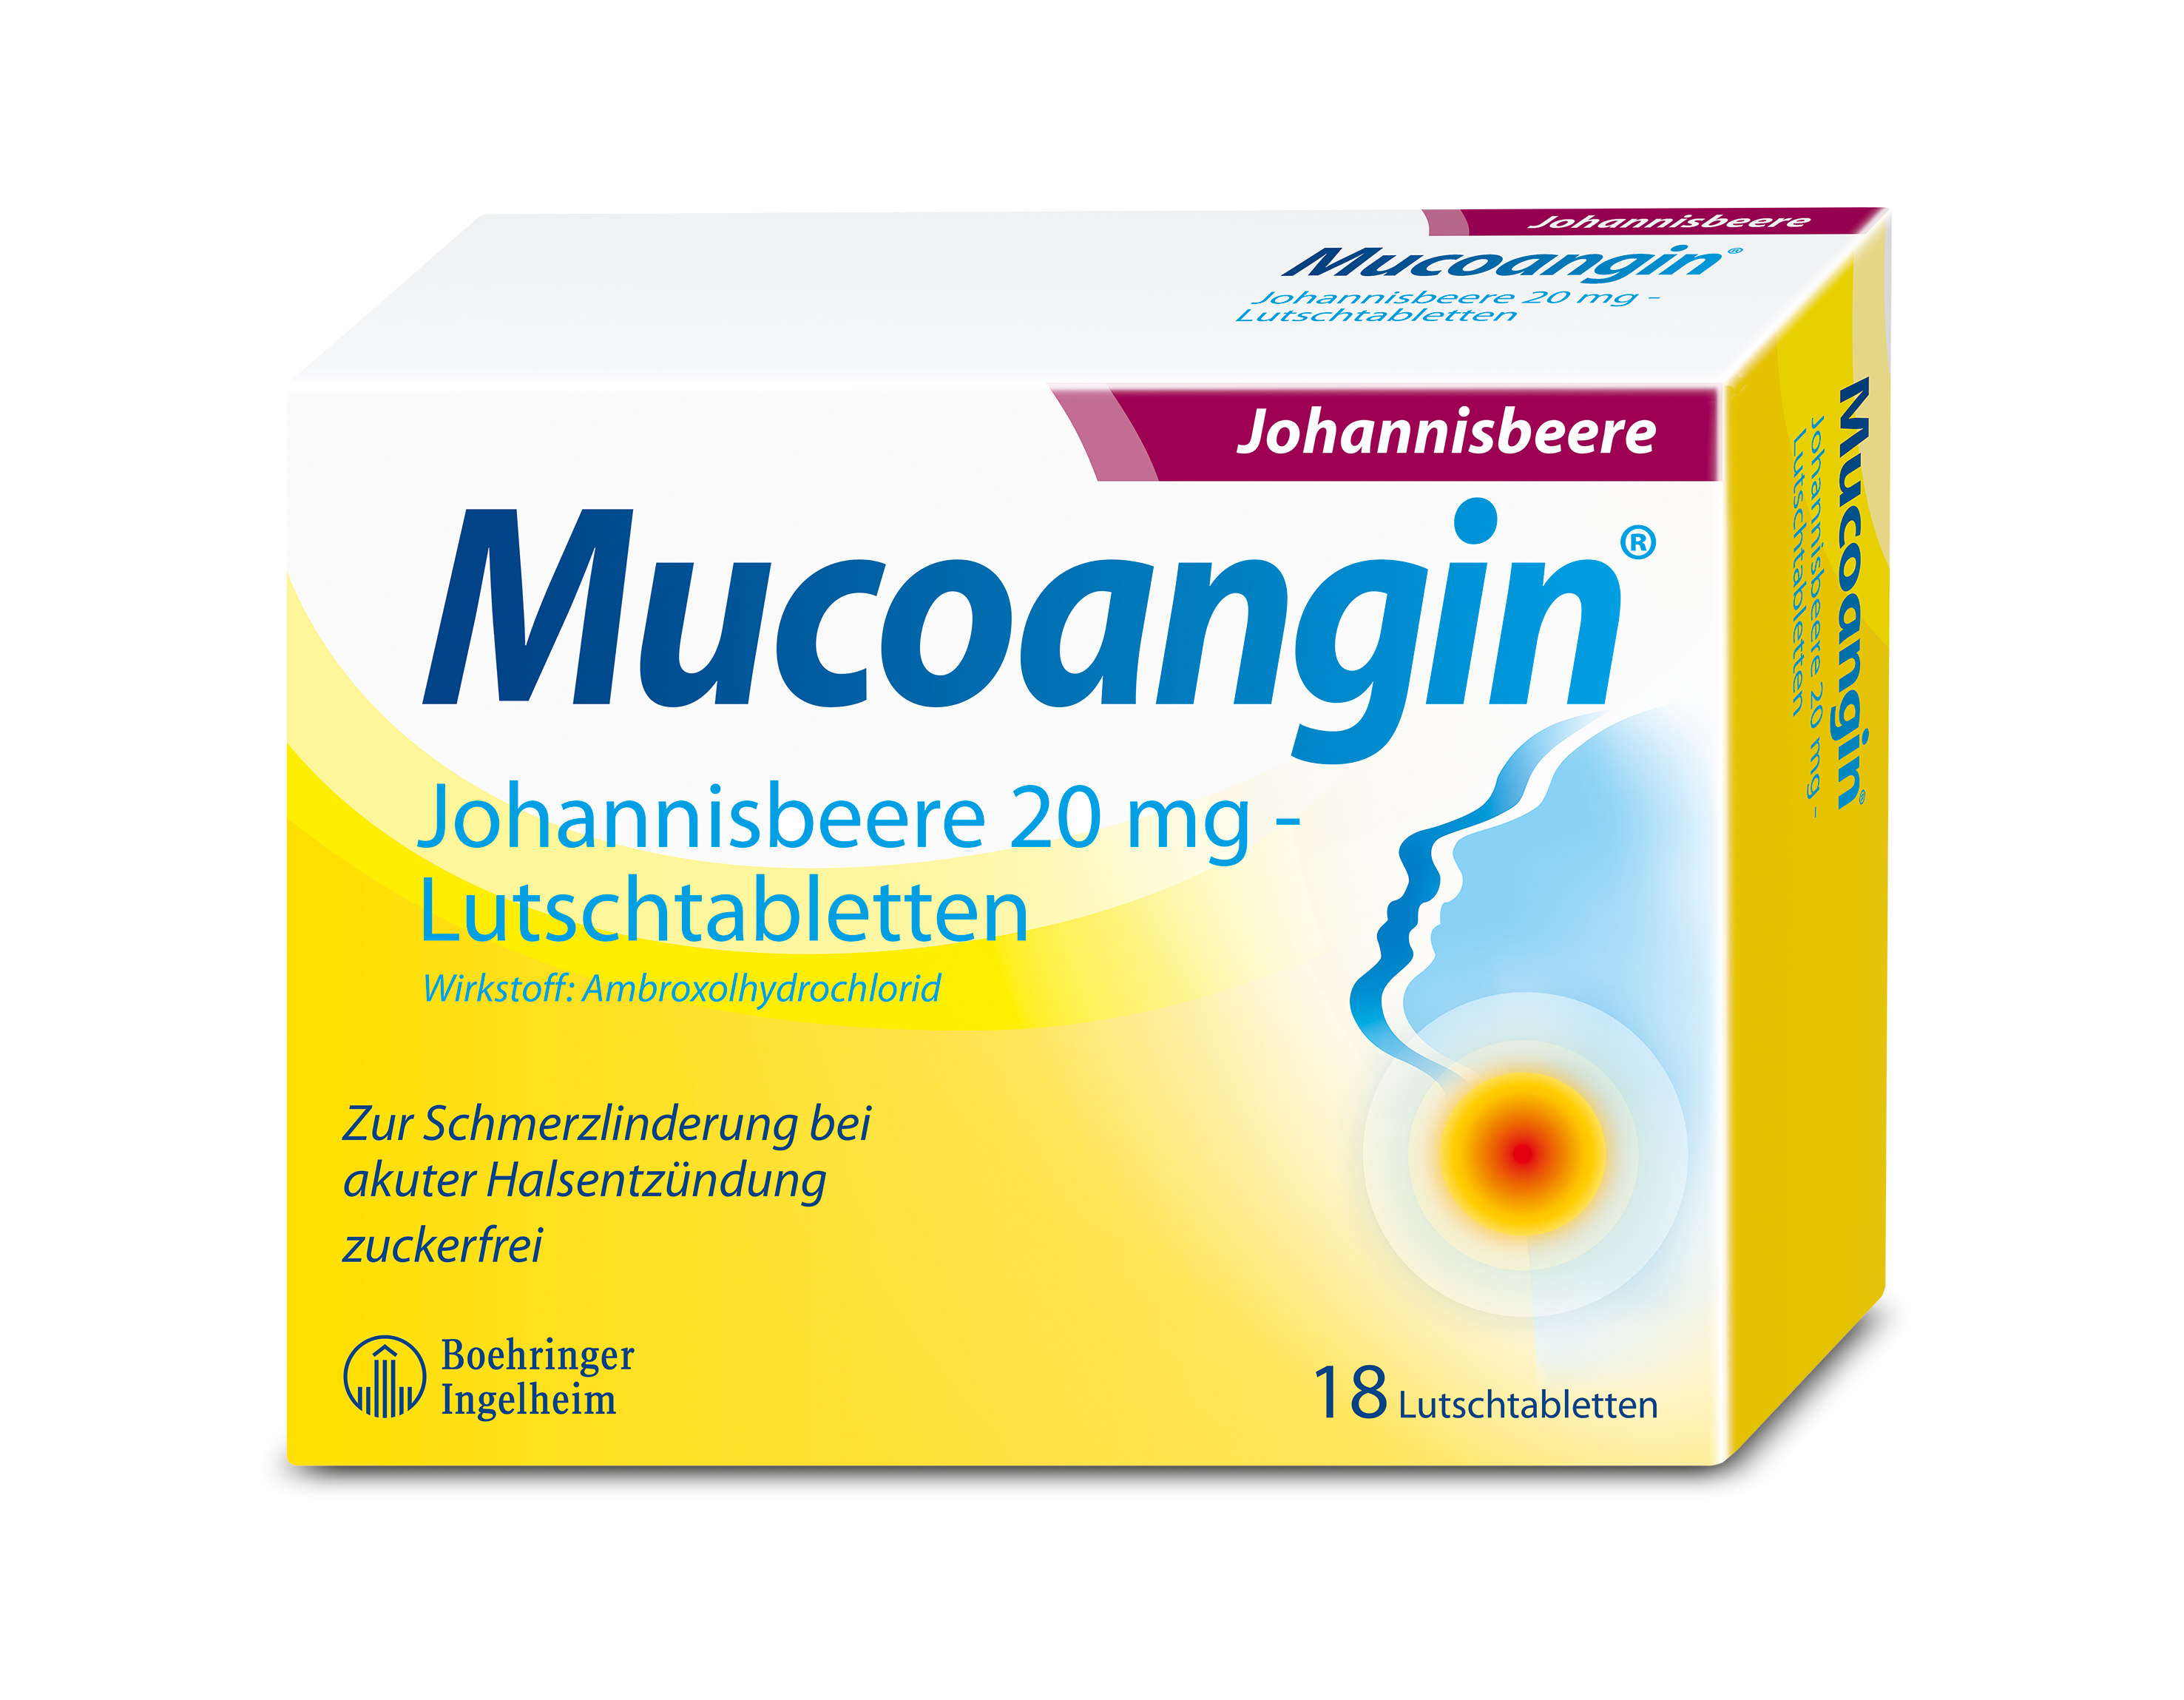 Mucoangin® Lutschtabletten gegen Halsschmerzen